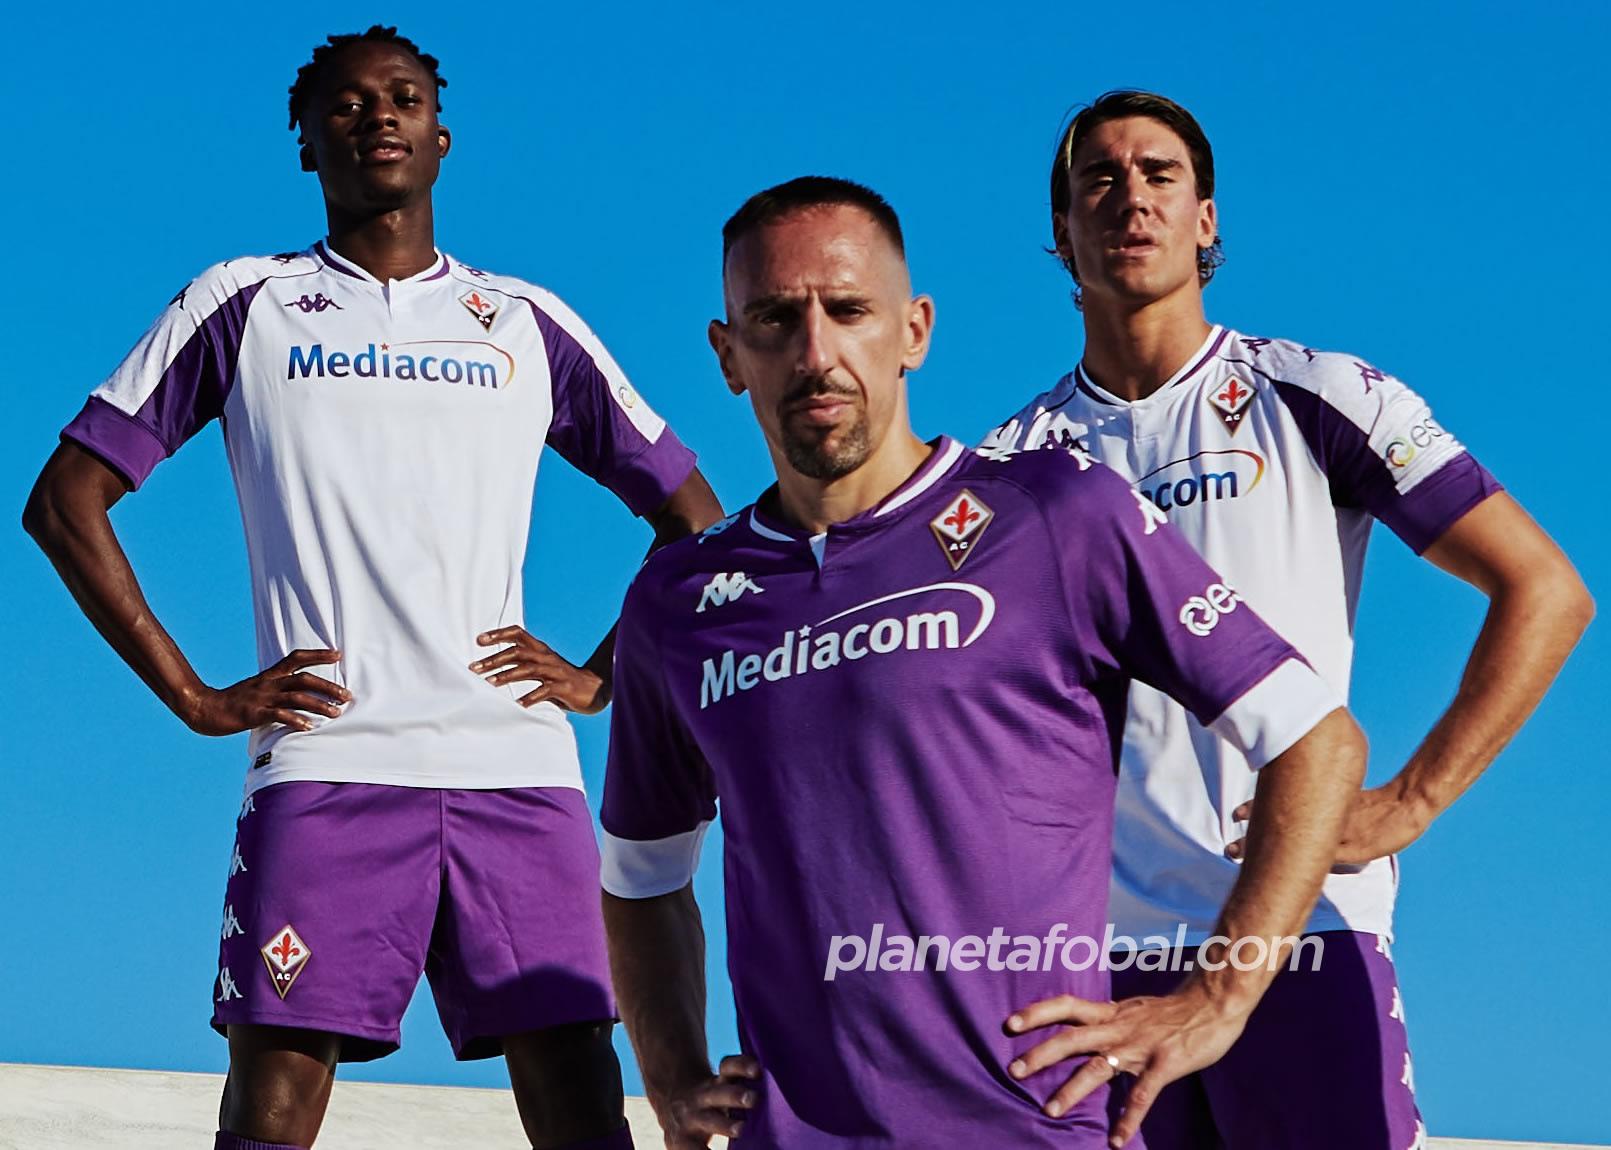 Gemidos Malawi Maravilloso  Camisetas Kappa de la Fiorentina 2020/21